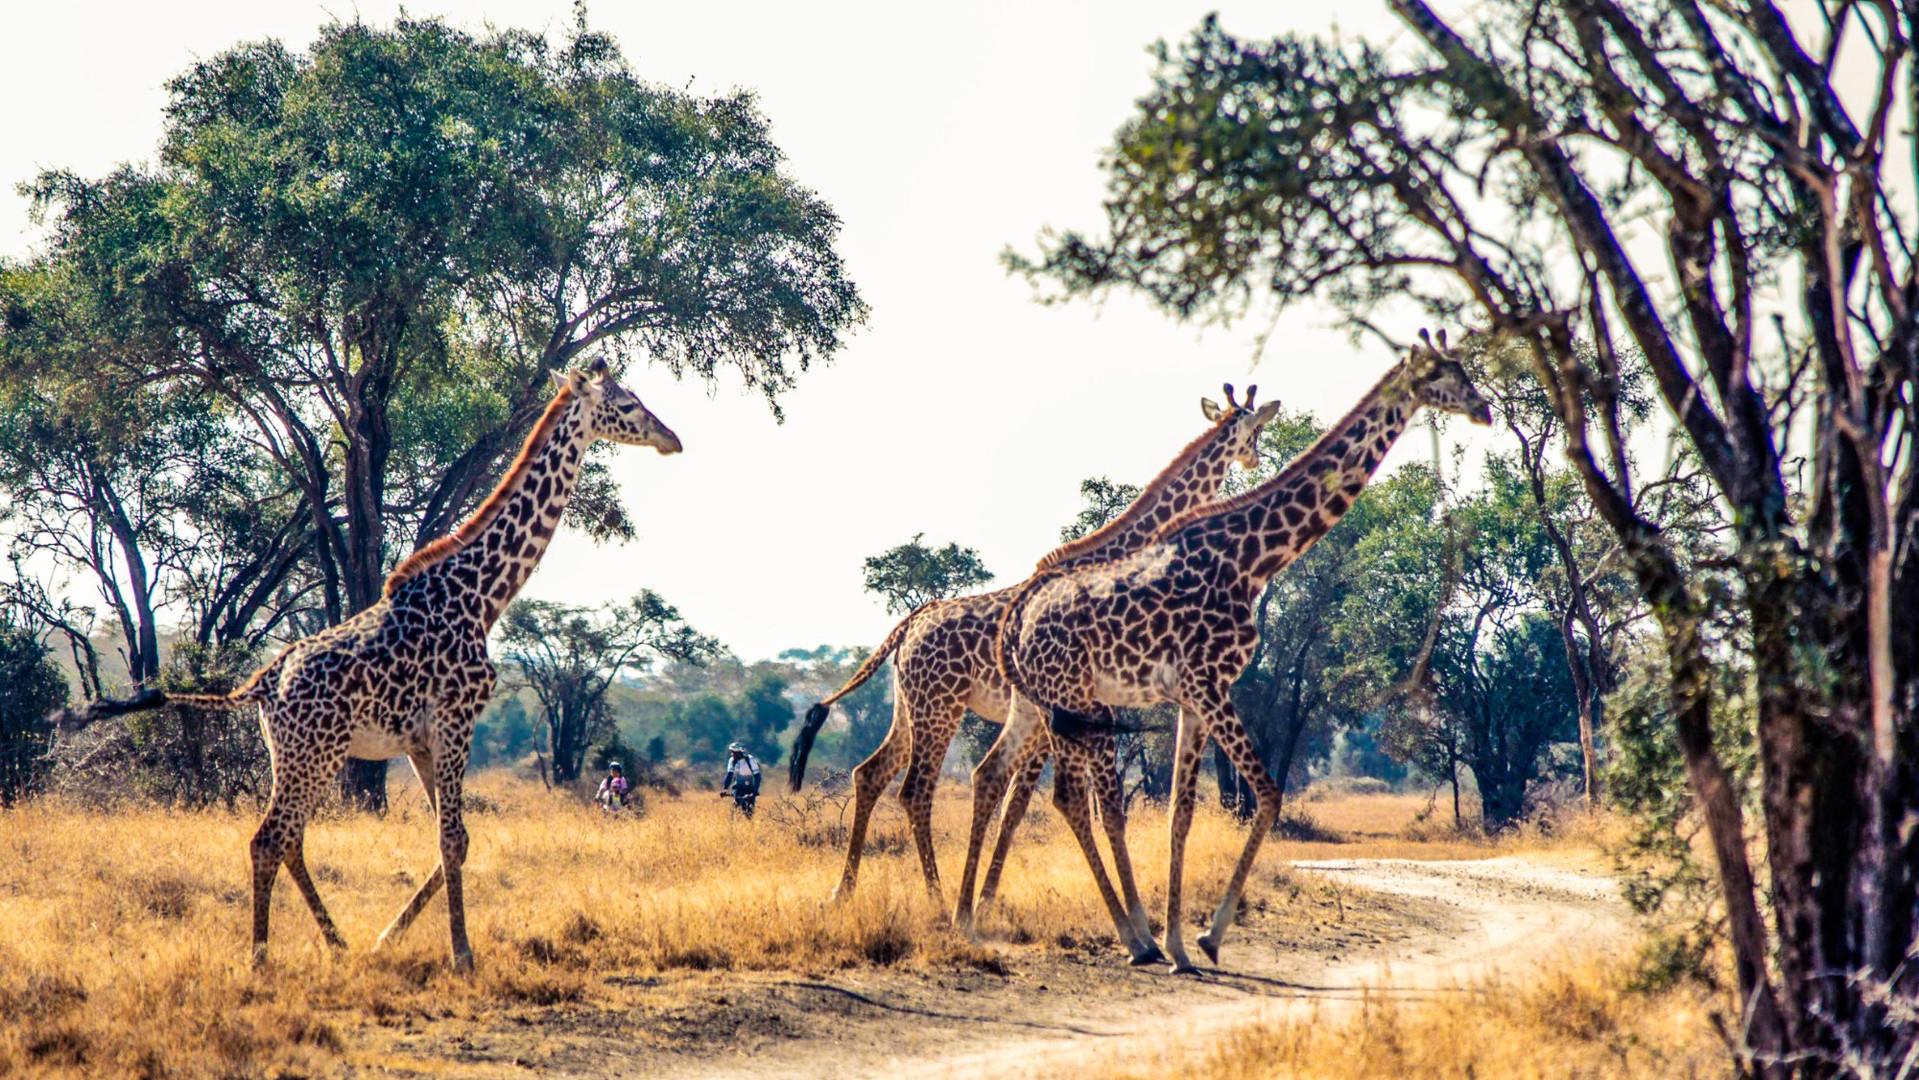 Giraffes_Crossing.jpg